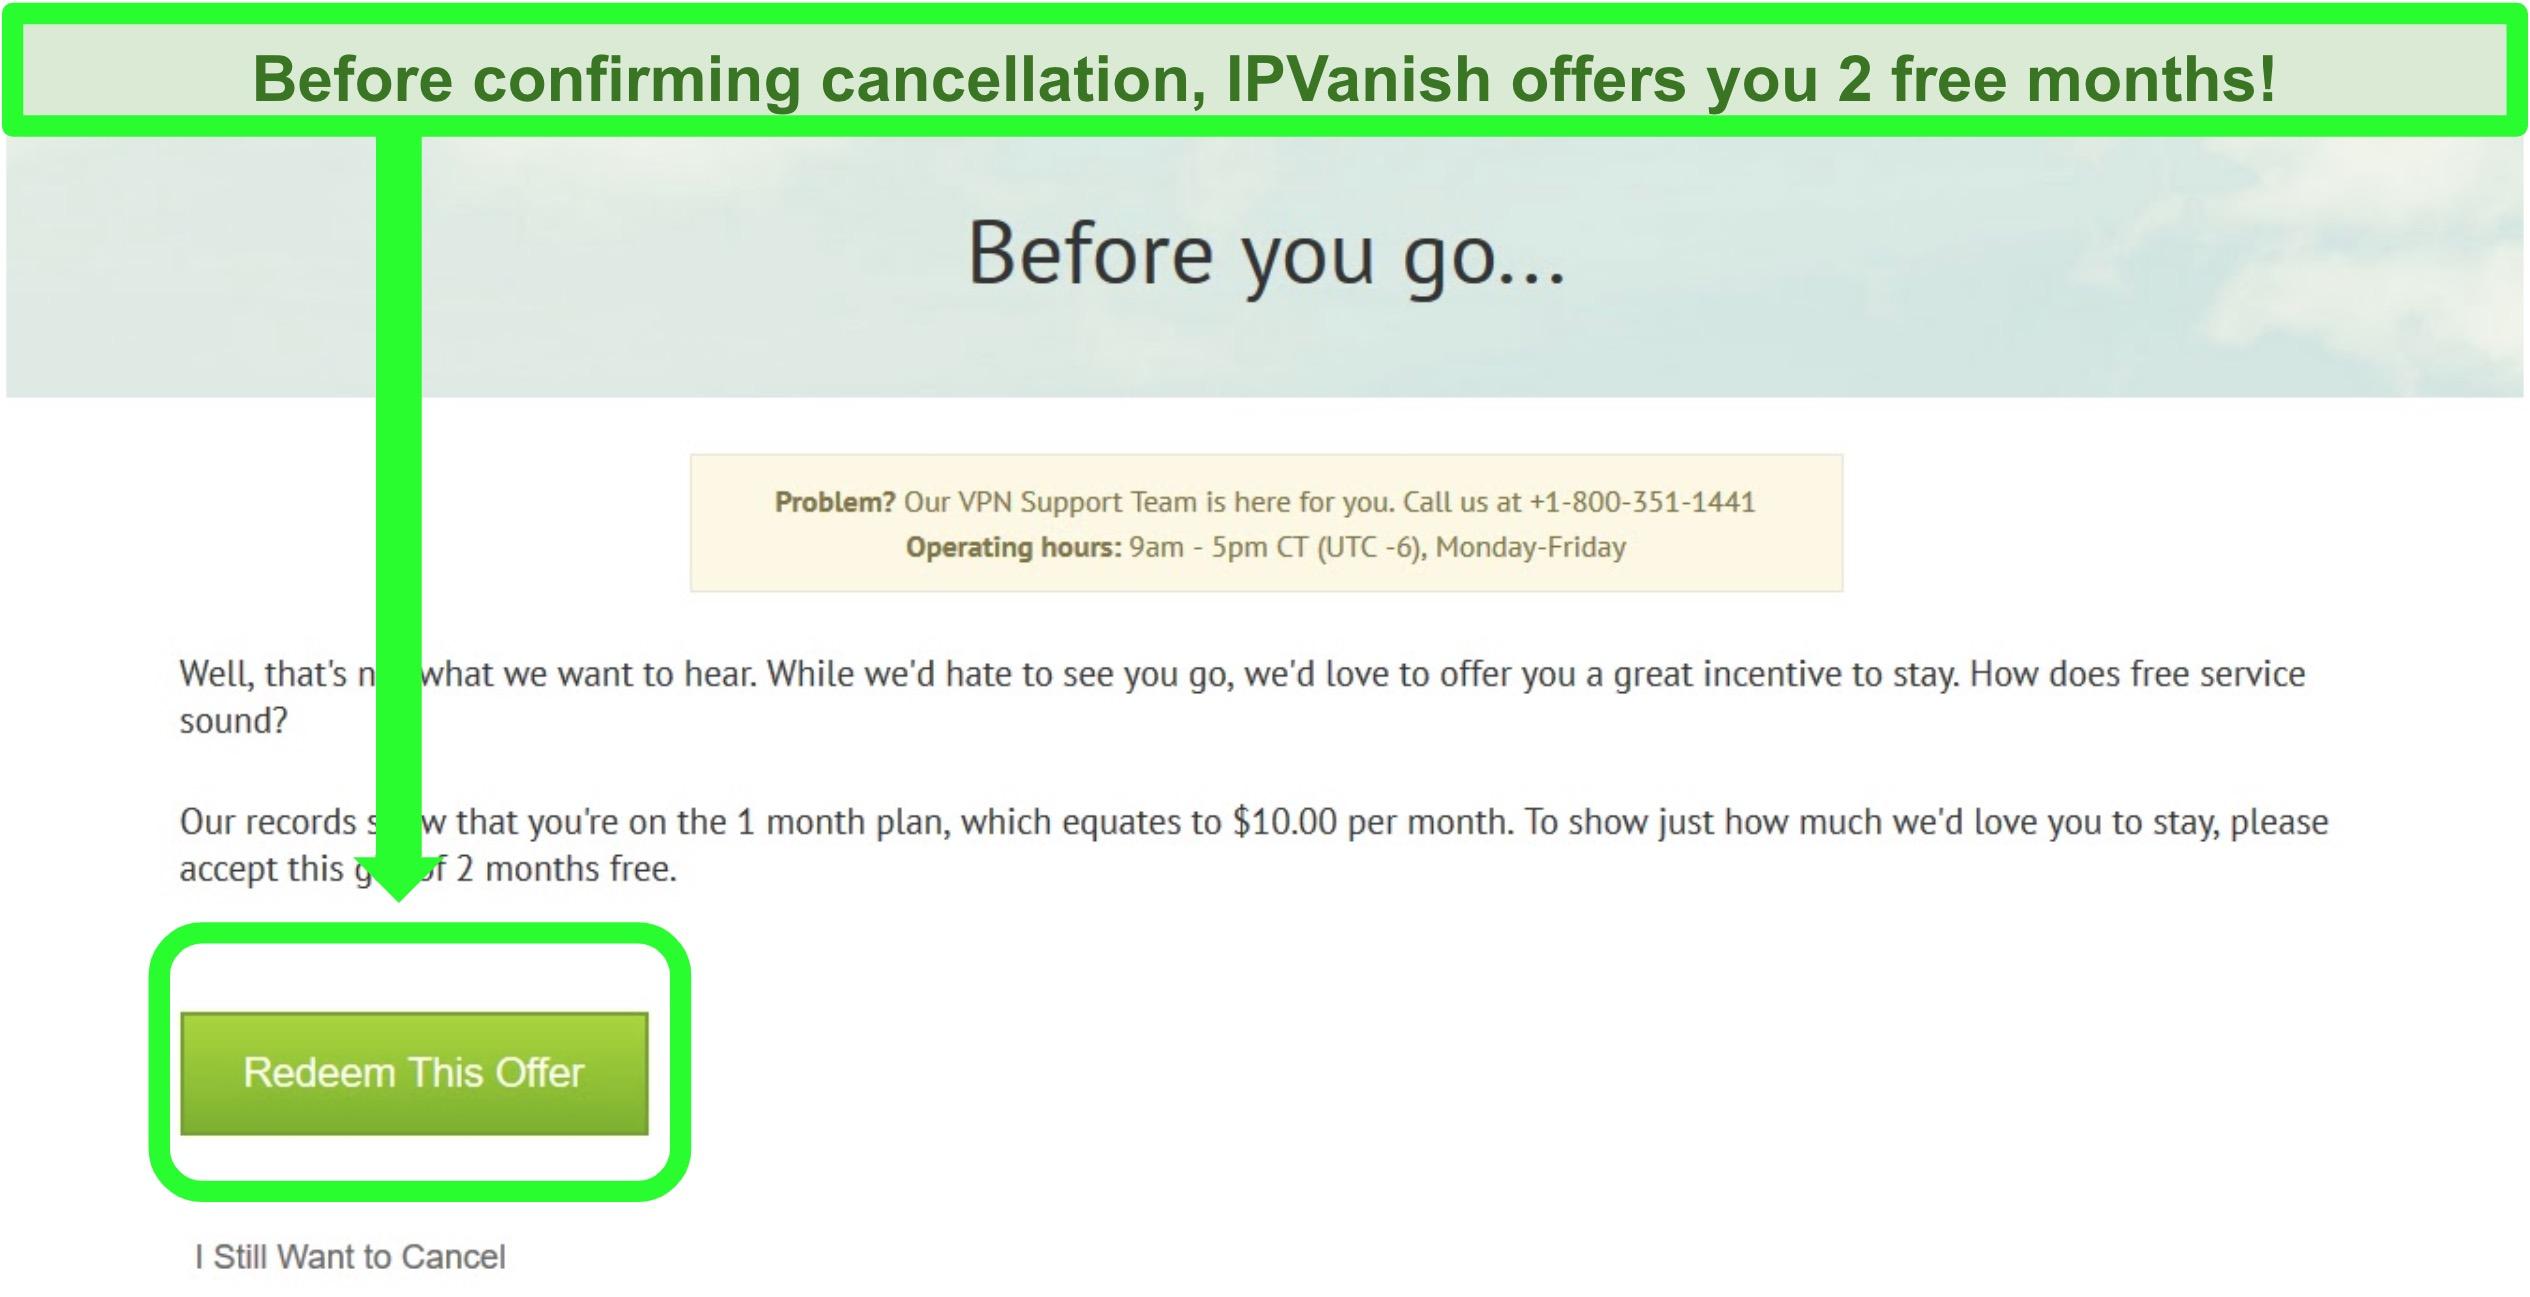 Screenshot of IPVanish's 2 month free offer screen